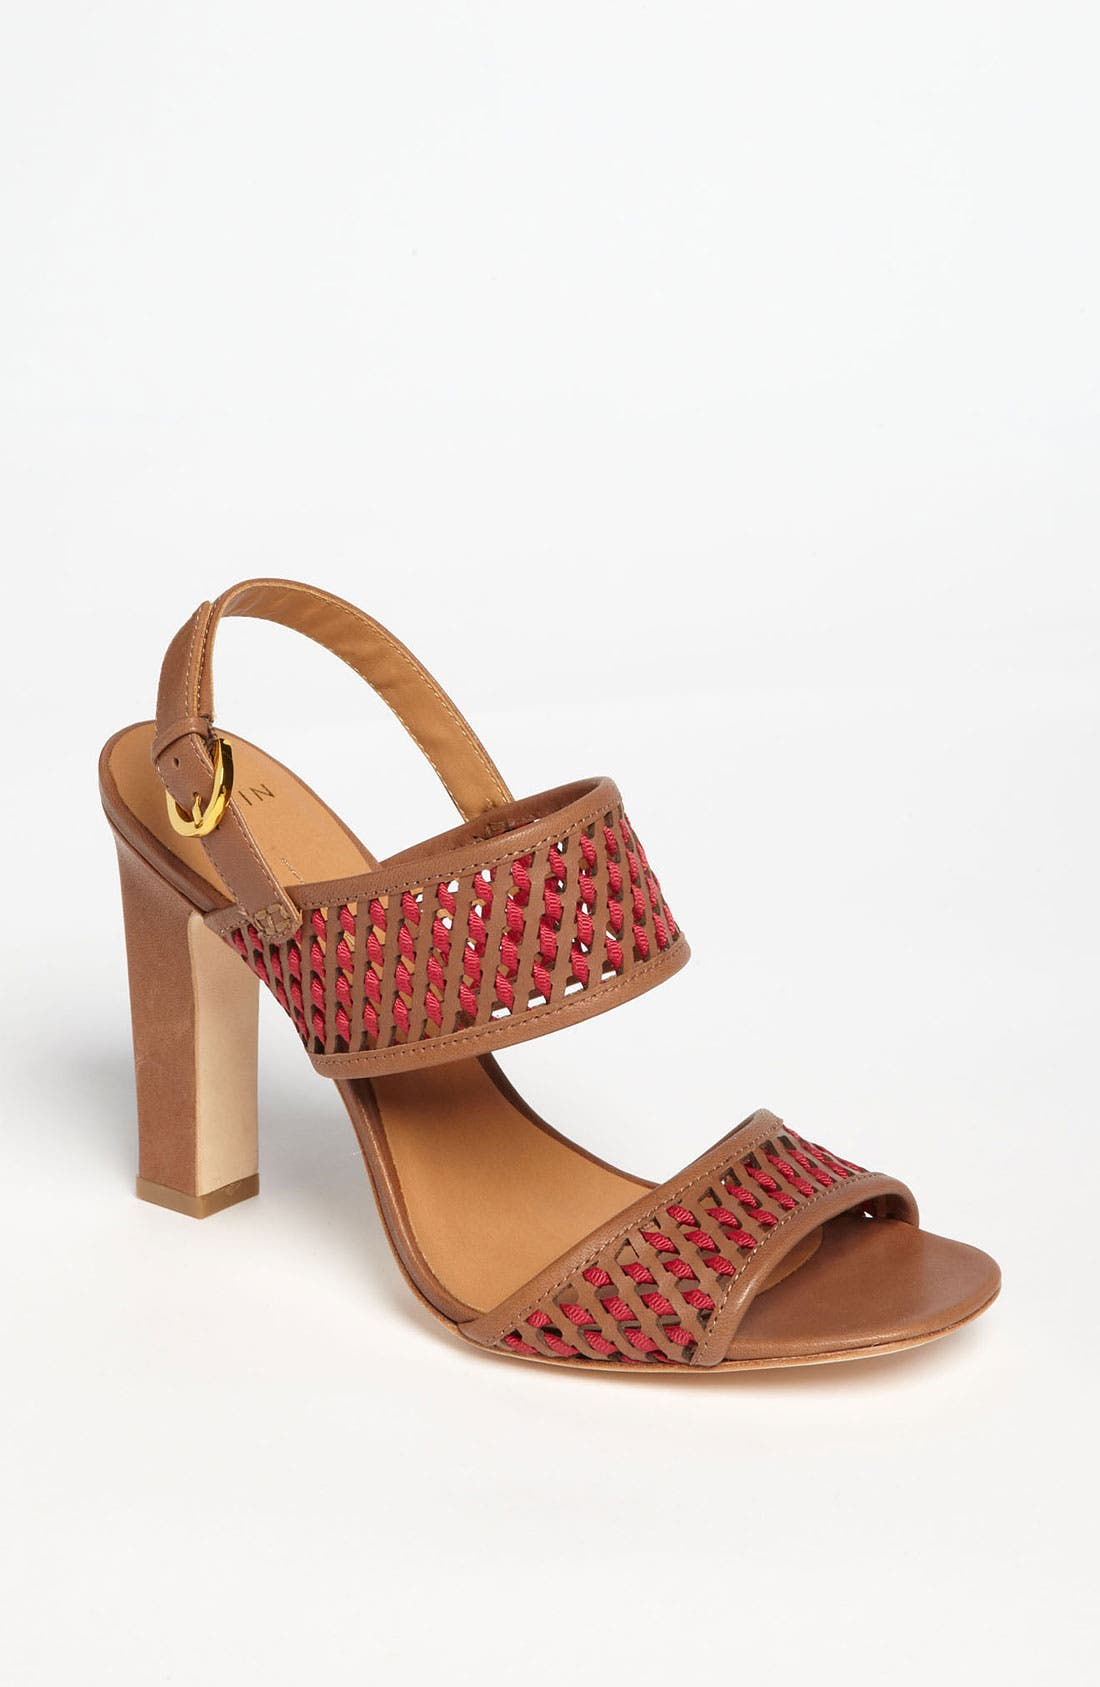 Alternate Image 1 Selected - Aerin 'Toiny' Sandal